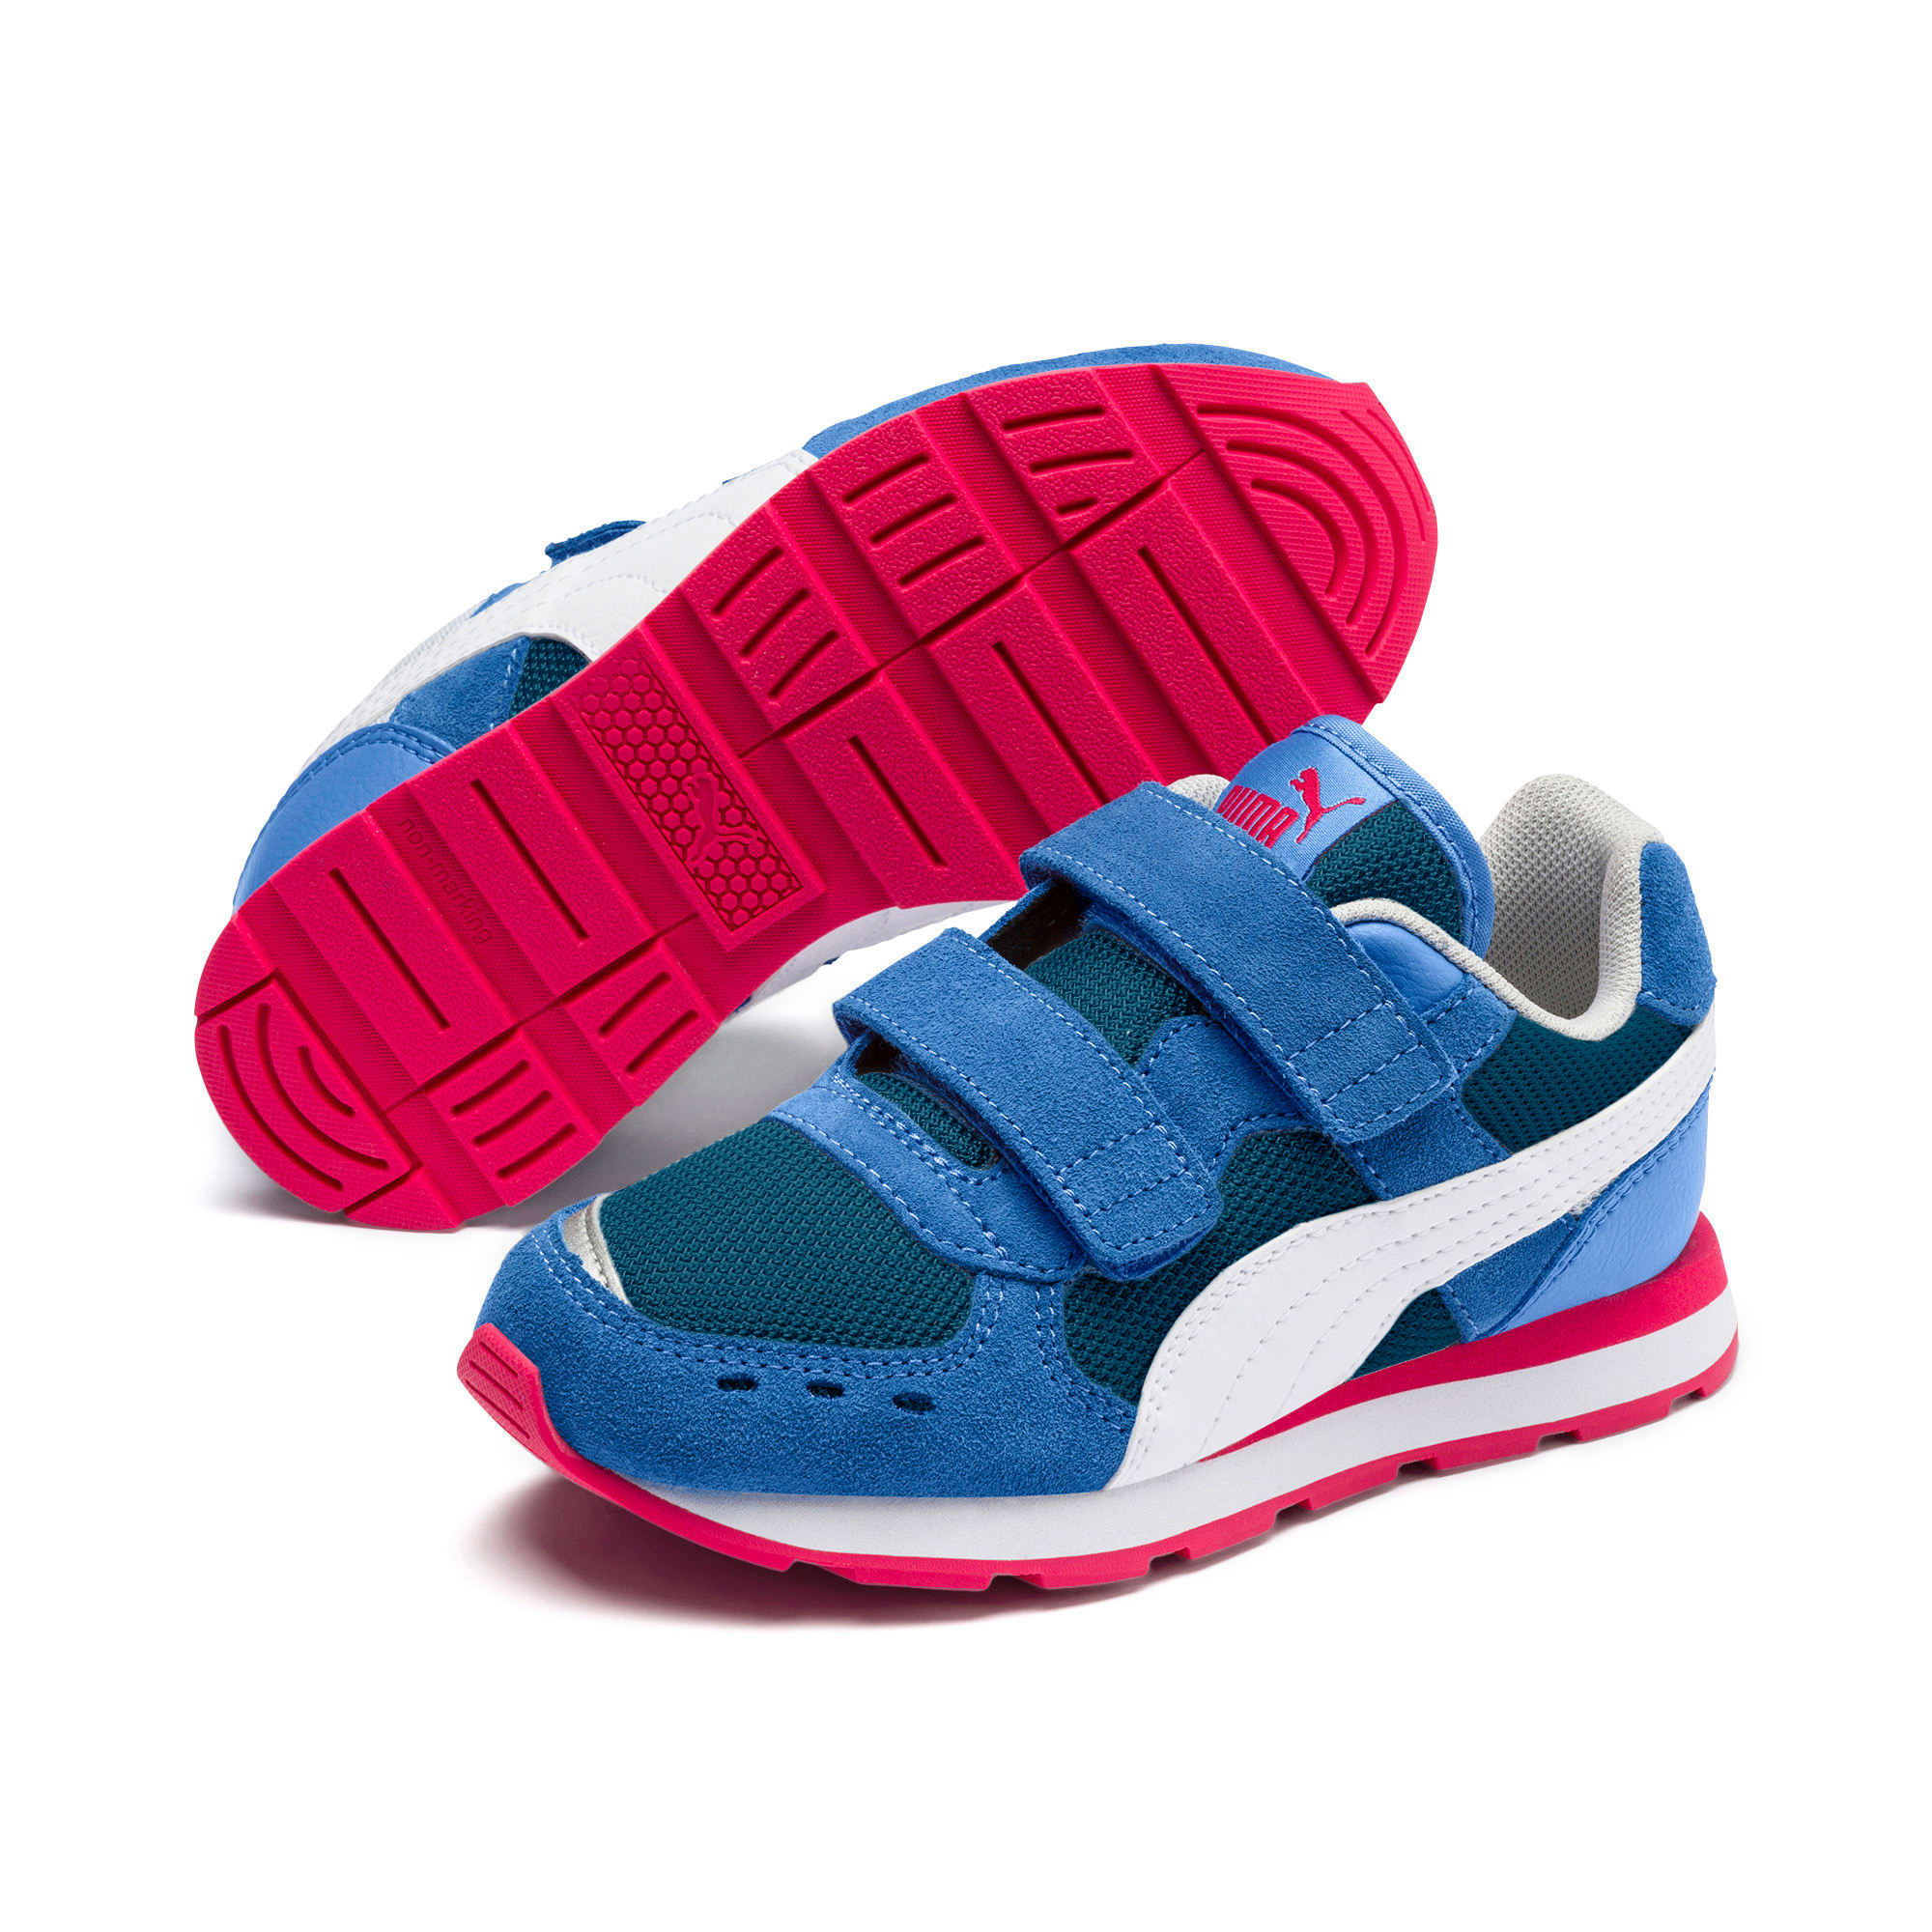 Thumbnail 5 of Vista Little Kids' Shoes, Ultramarine-Puma White, medium